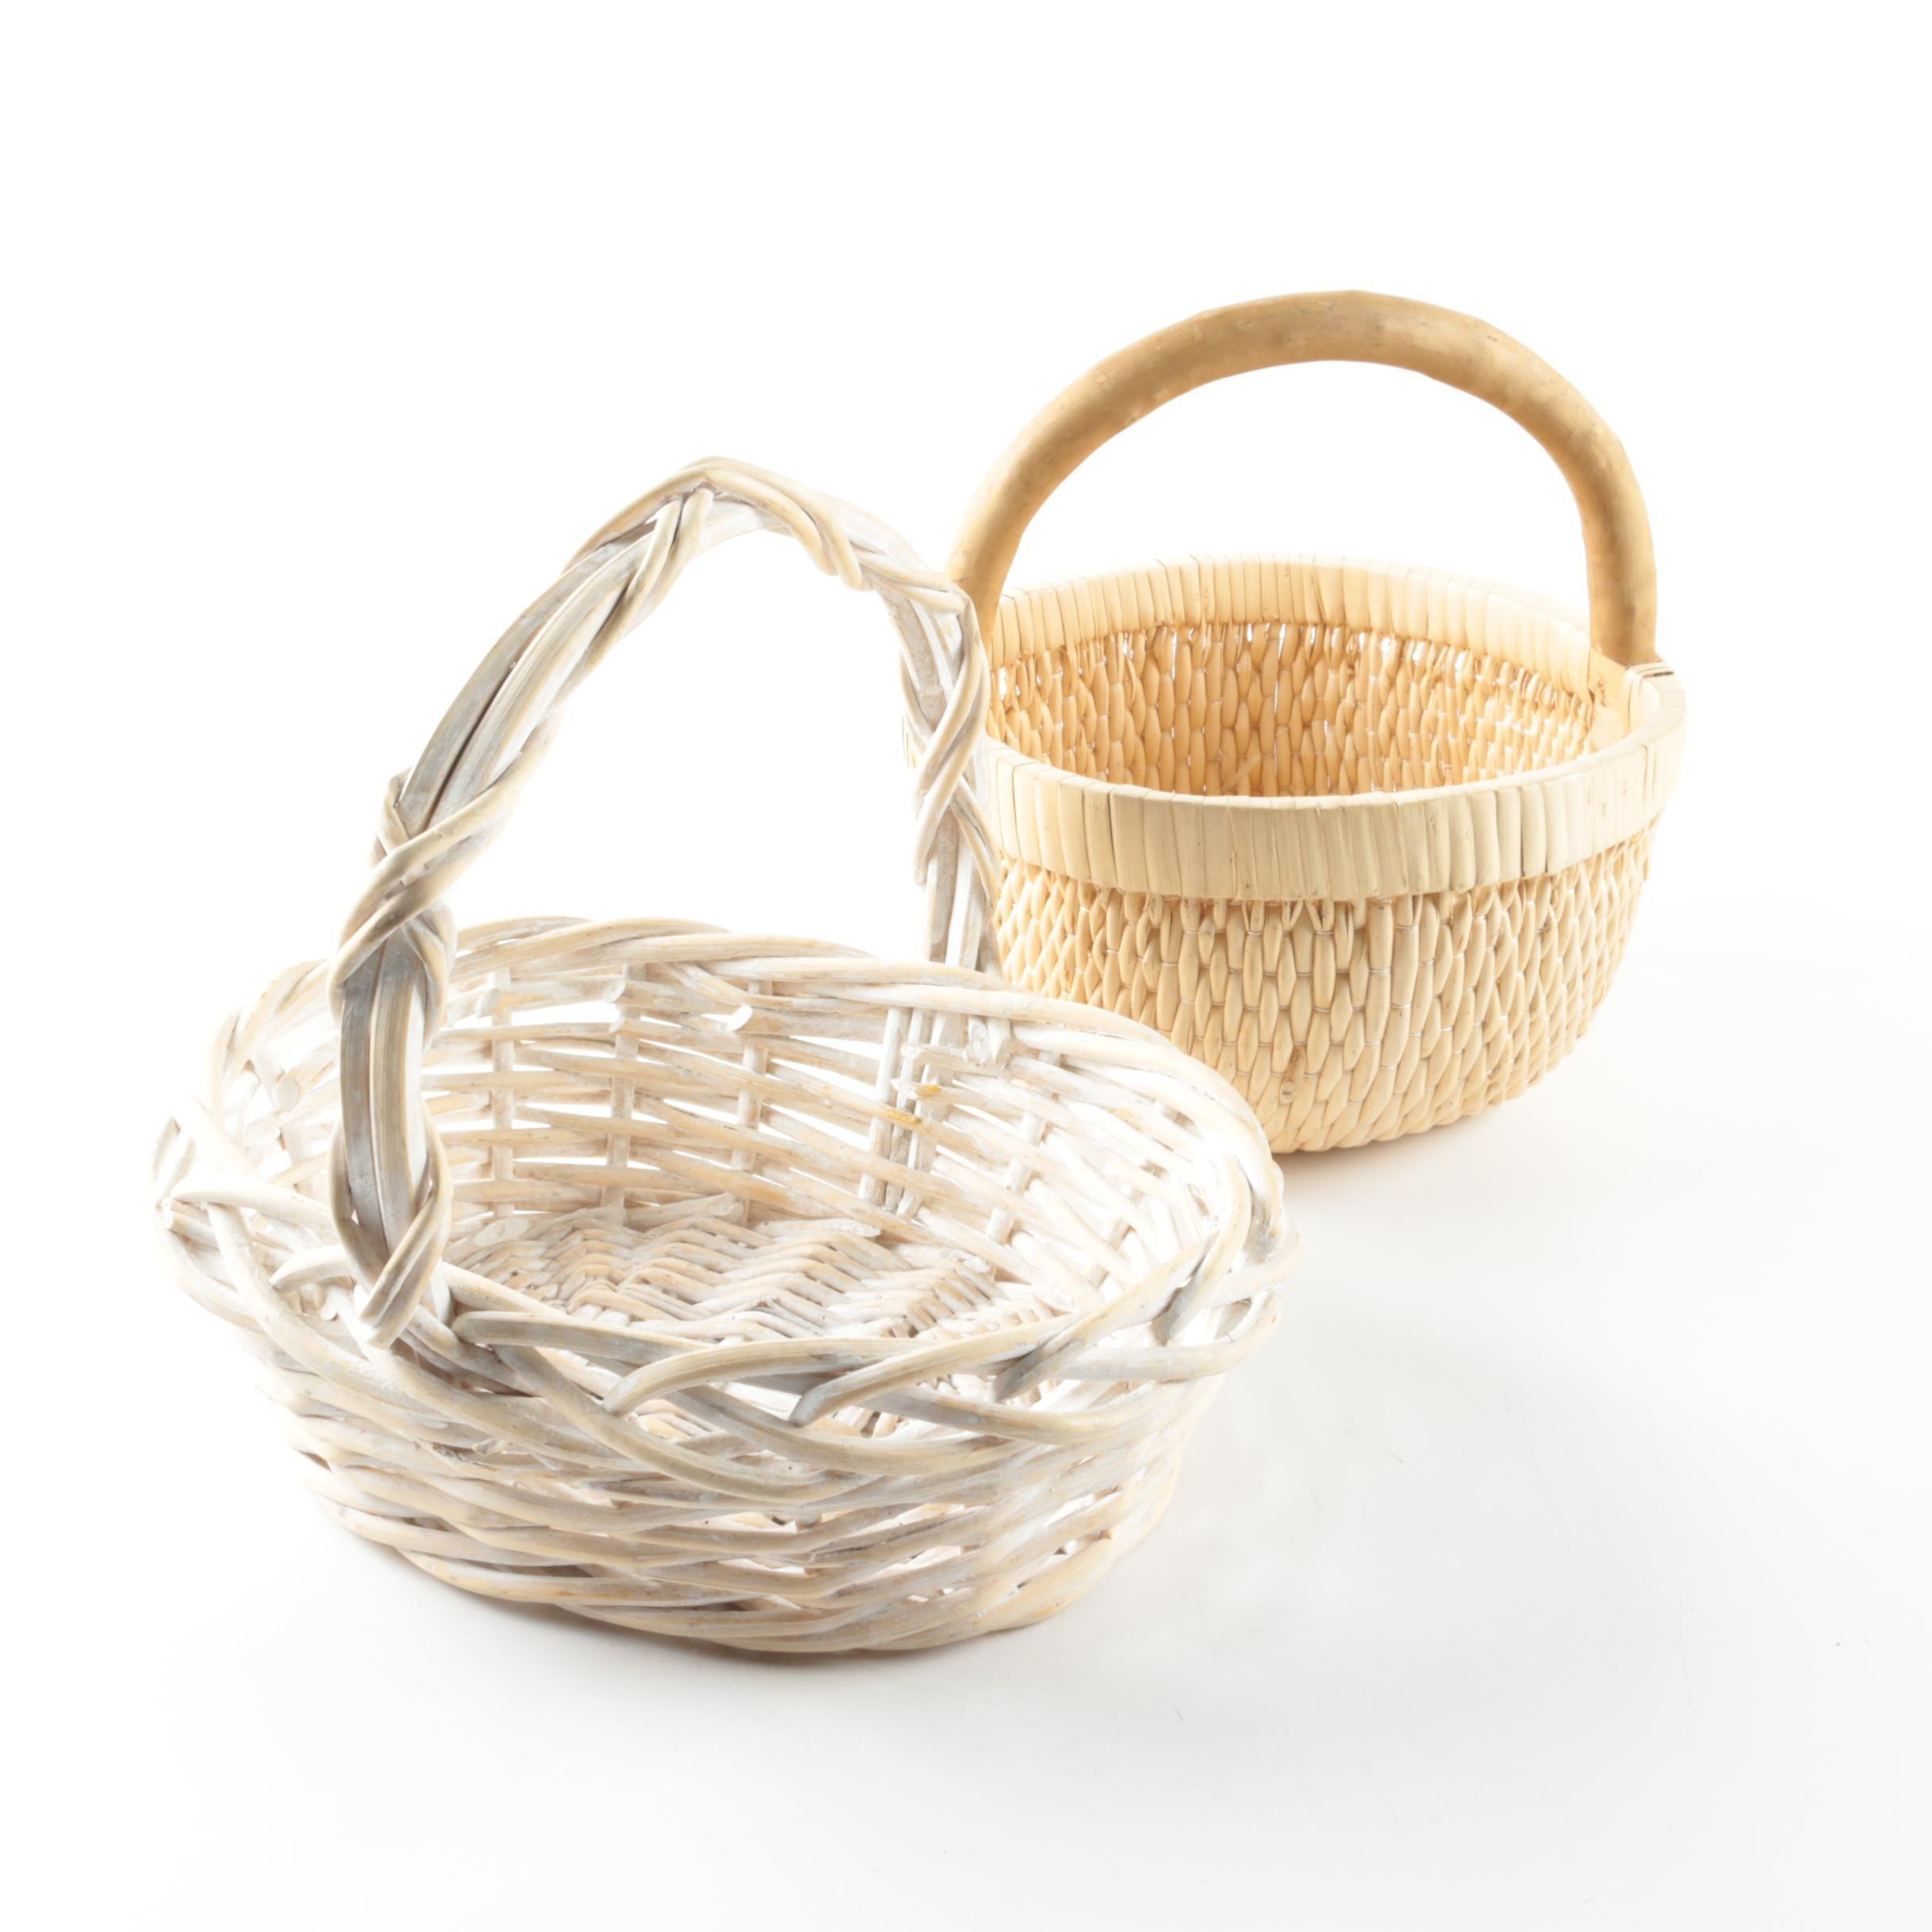 Handled Woven Baskets